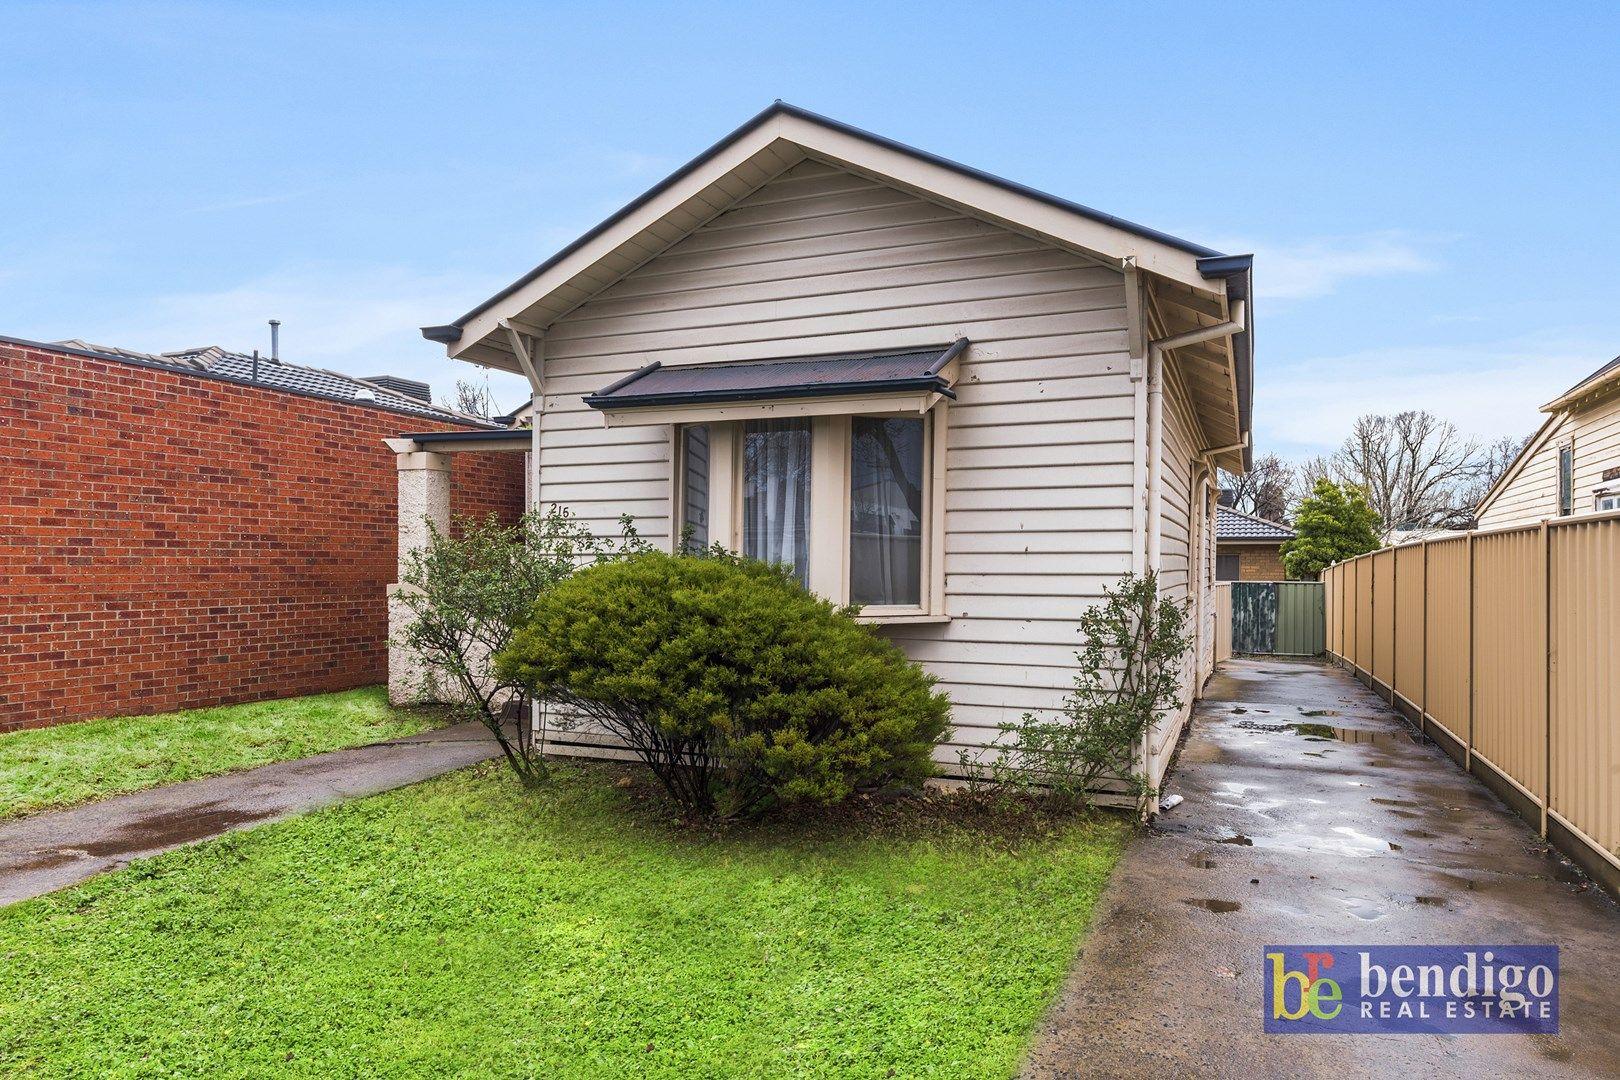 215 McCrae Street, Bendigo VIC 3550, Image 2